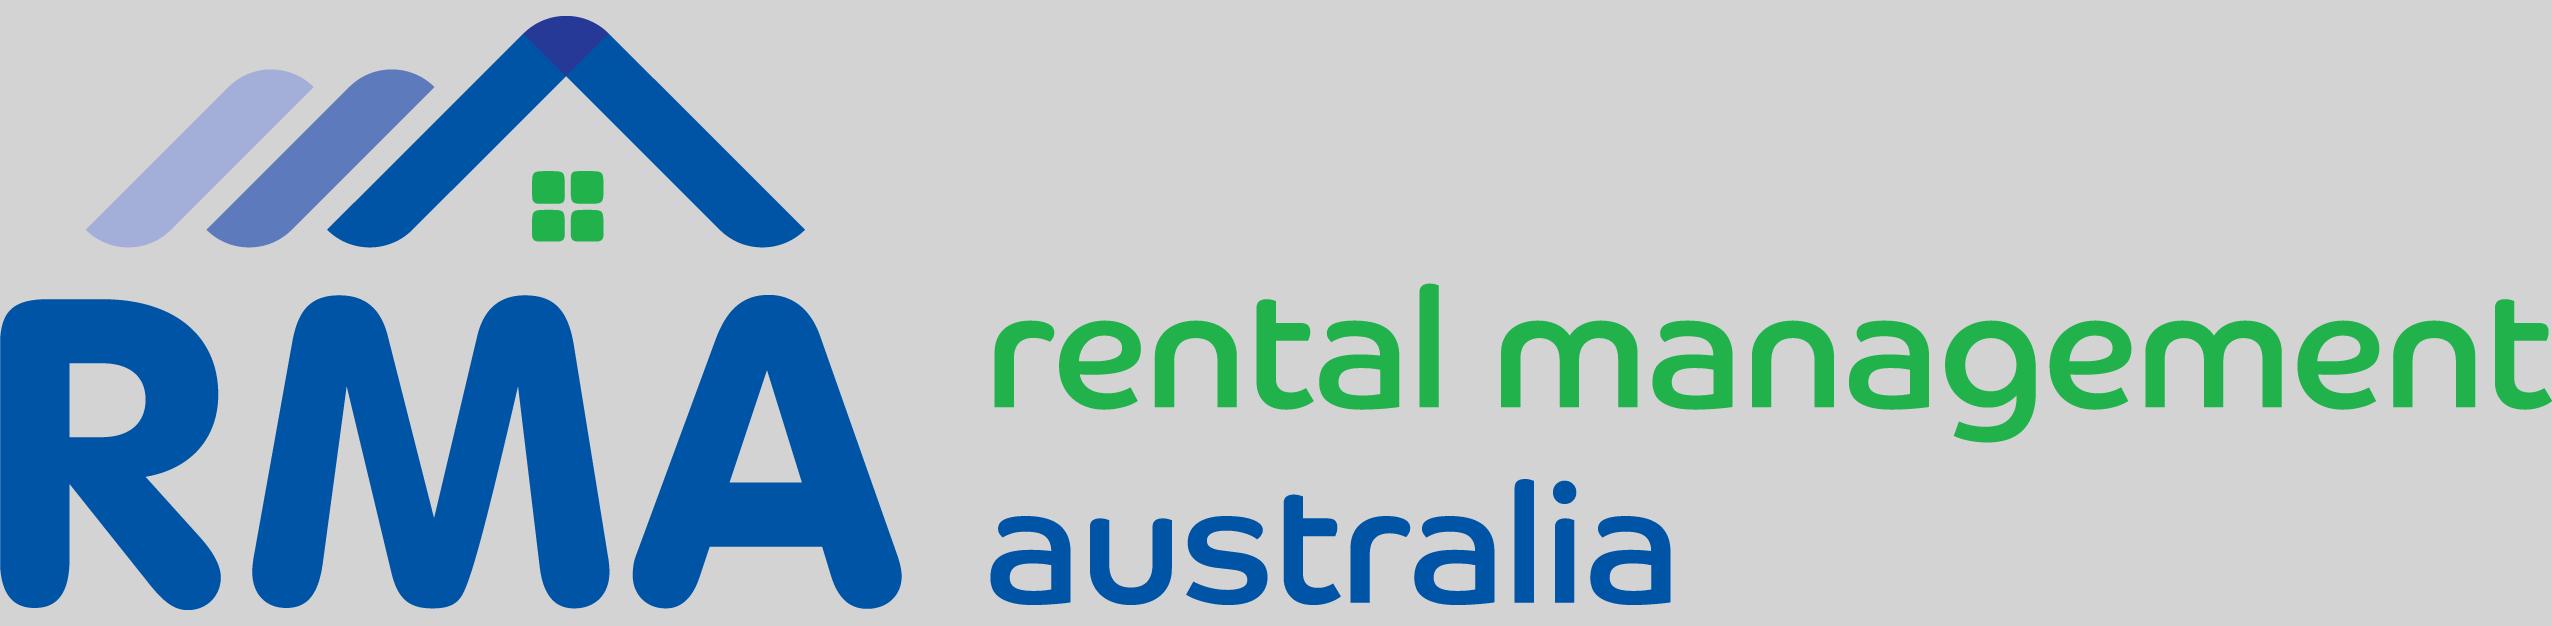 Rental Management Australia, Port Kennedy, 6172